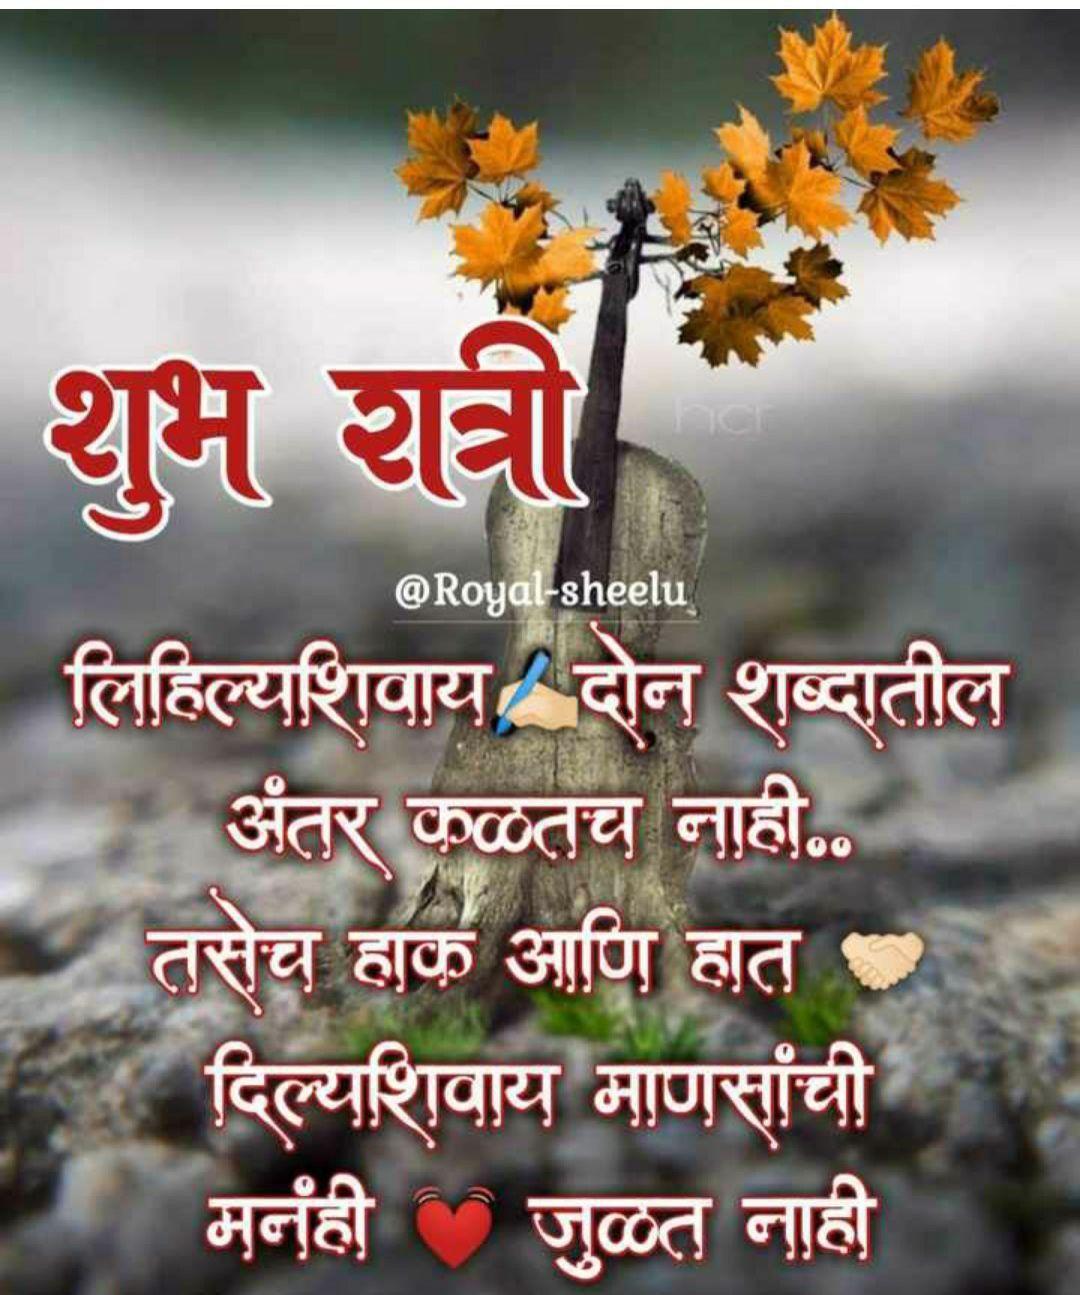 Pin By Vinay Ardekar On Good Night Good Night Quotes Good Night Messages Good Night Love Images